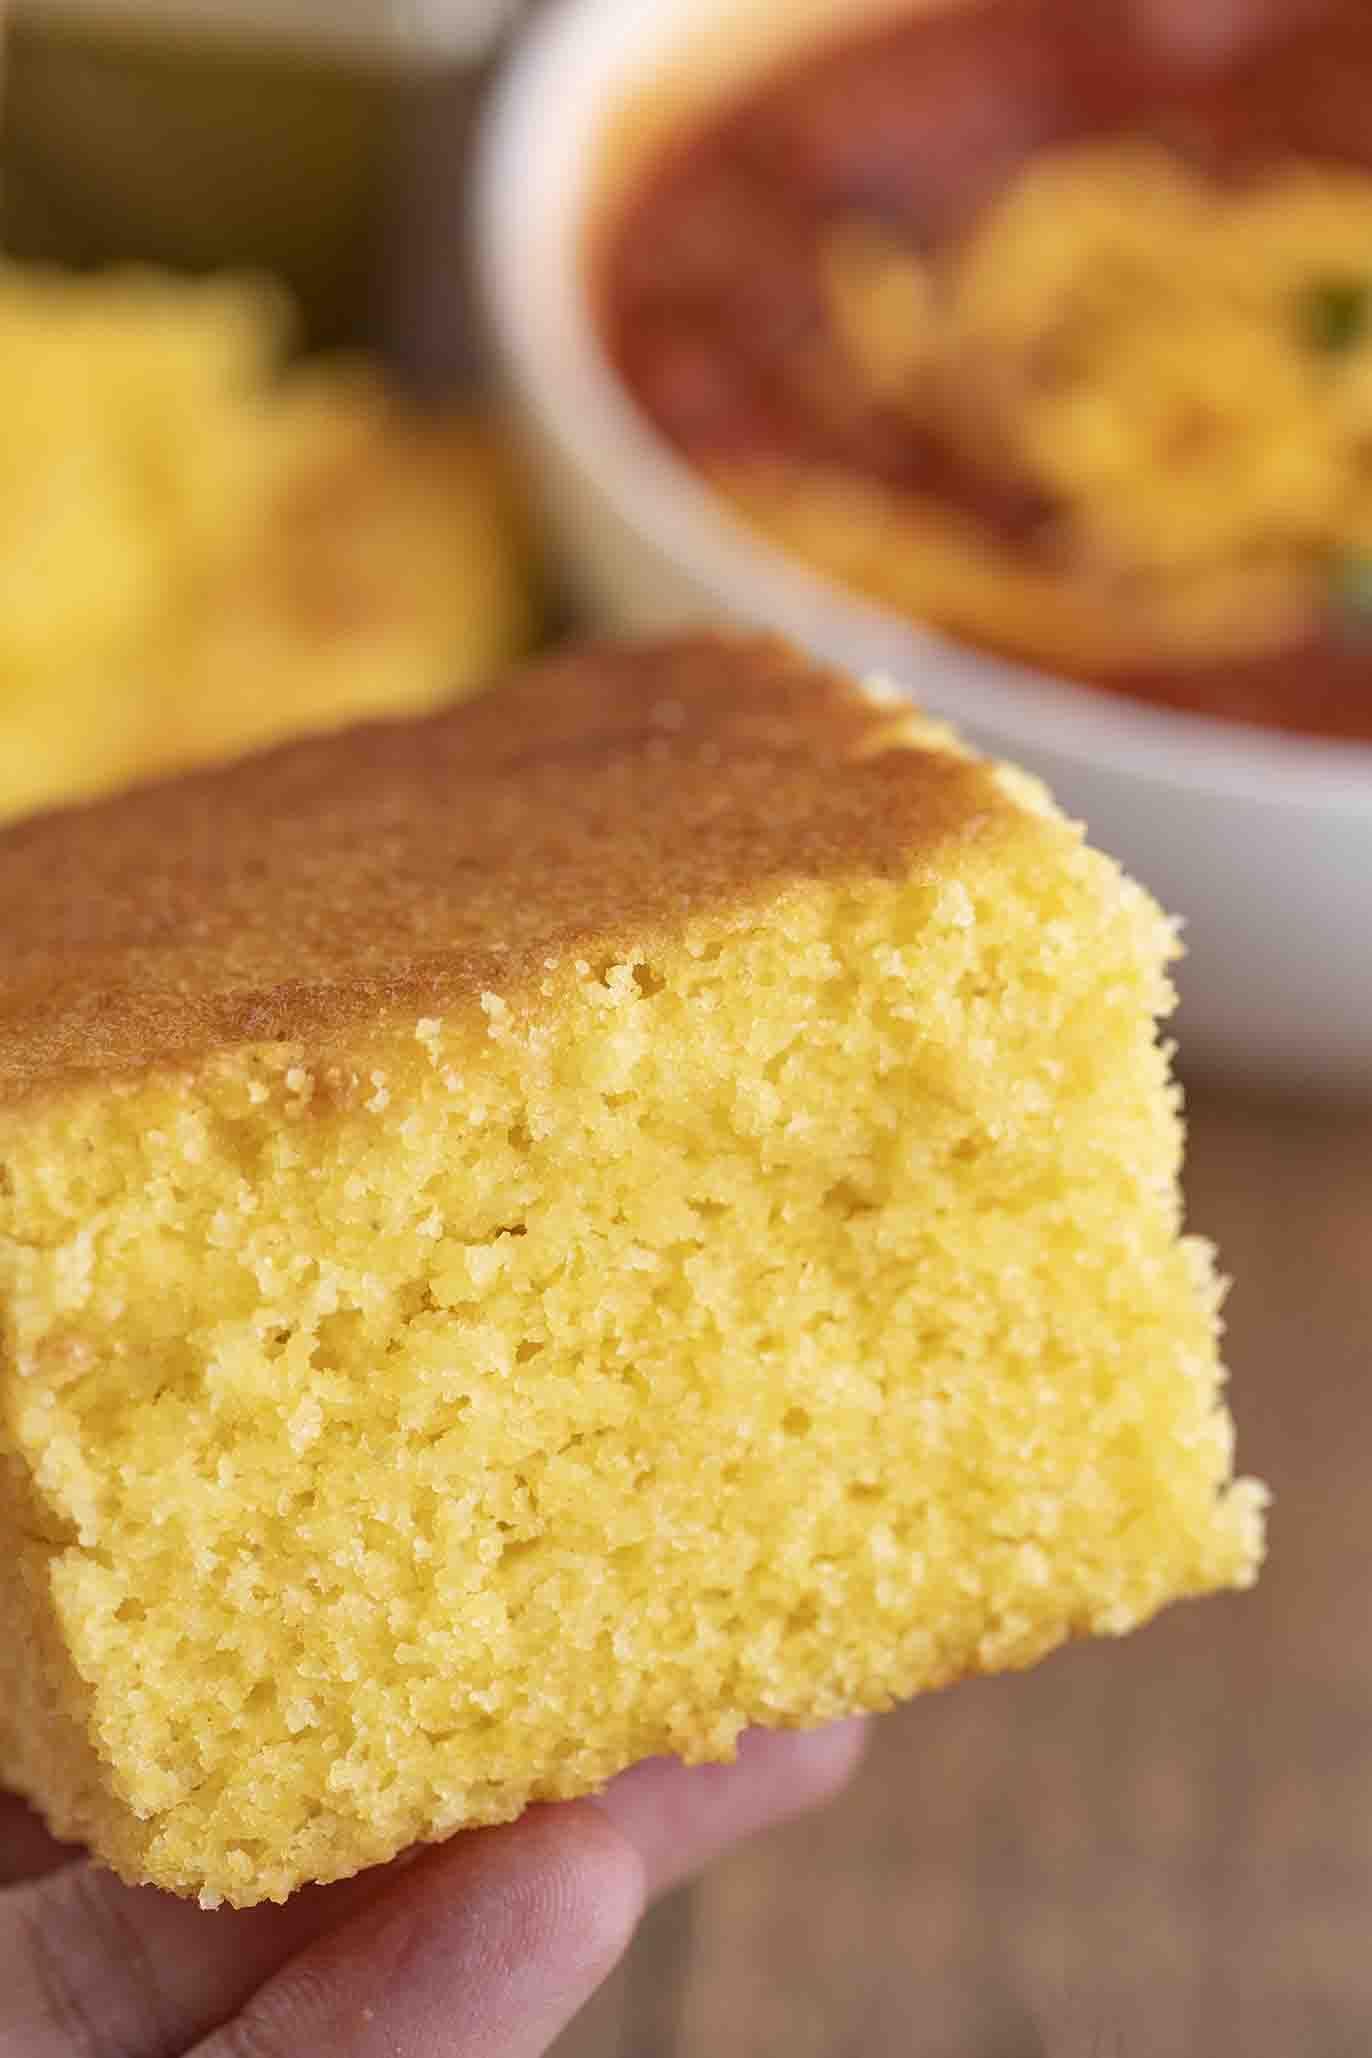 Ultimate Cornbread Delicious I Used Buttermilk Instead Of Milk Johnny Cakes Recipe Butter Cake Recipe Cake Recipes